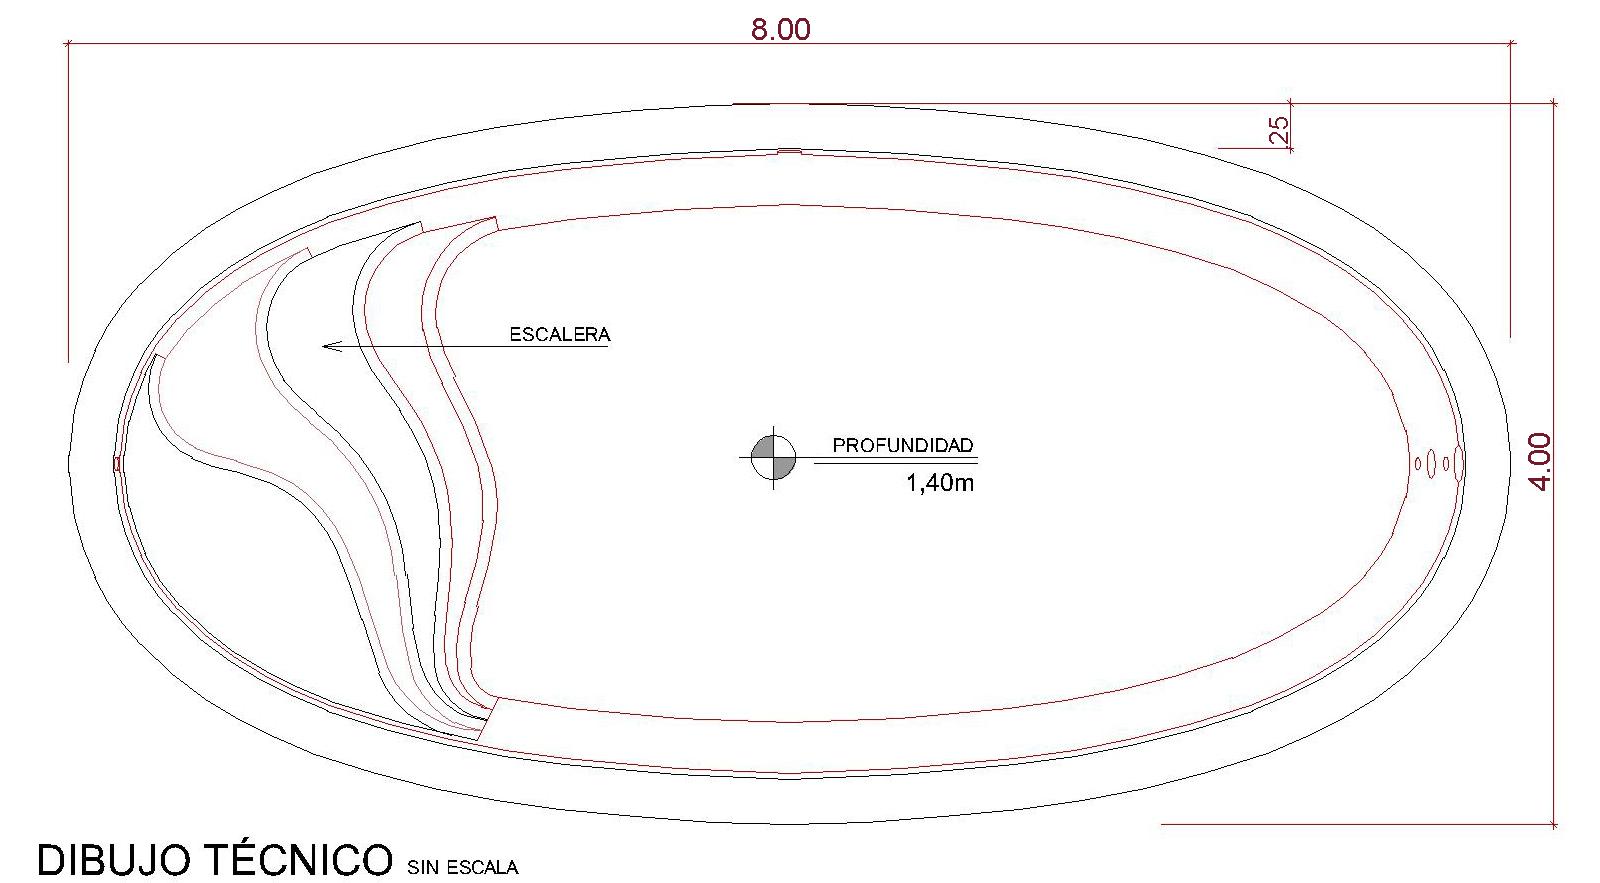 Dibujos técnicos Komôdo (sin escala)